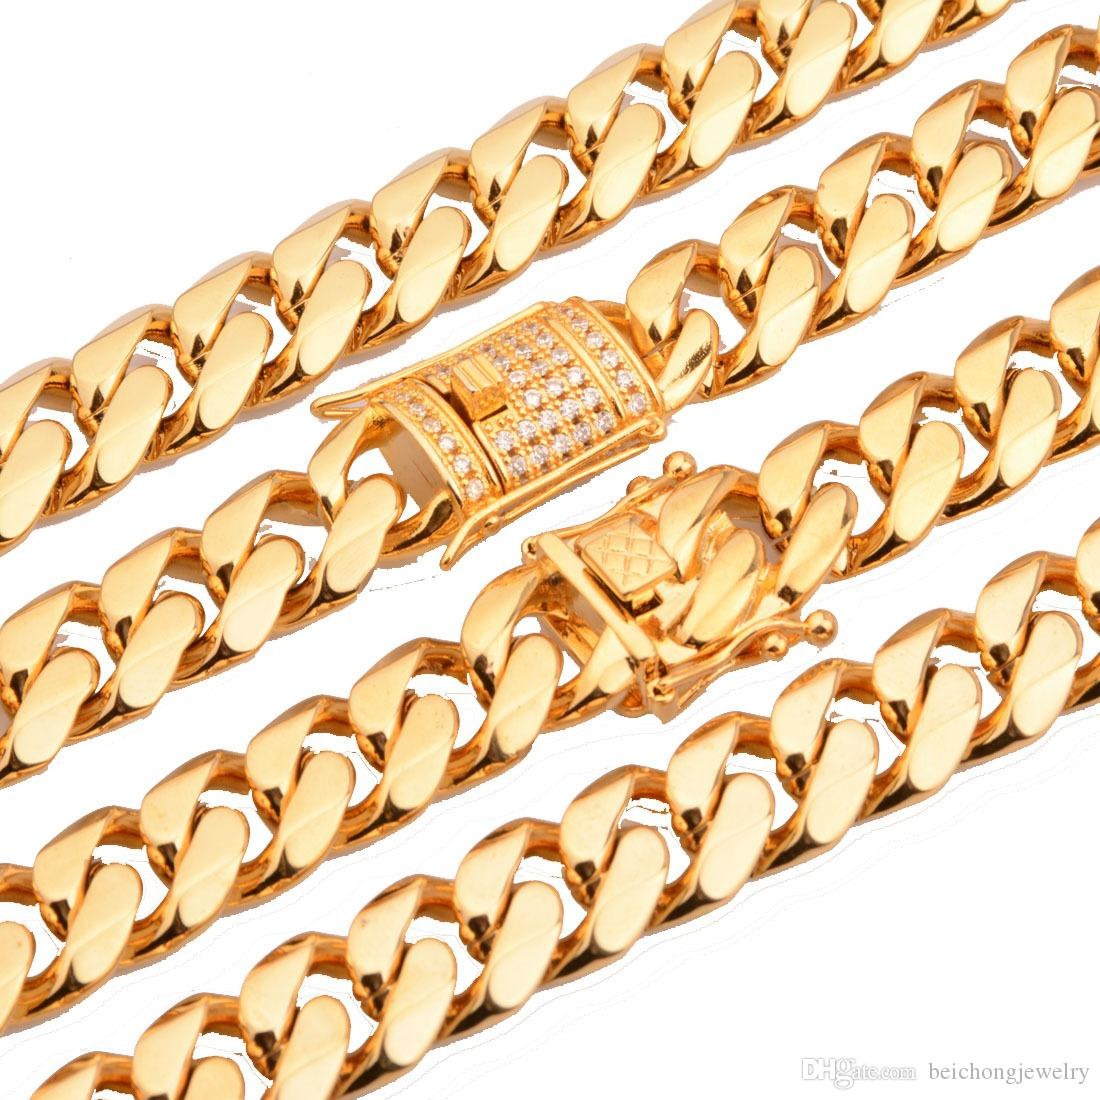 Beichong Edelstahl Schmuck 18 Karat Gold Gefüllt Überzogene Hochglanzpolierte Miami Cuban Link Halskette Männer Punk Panzerkette Drachenbart ...